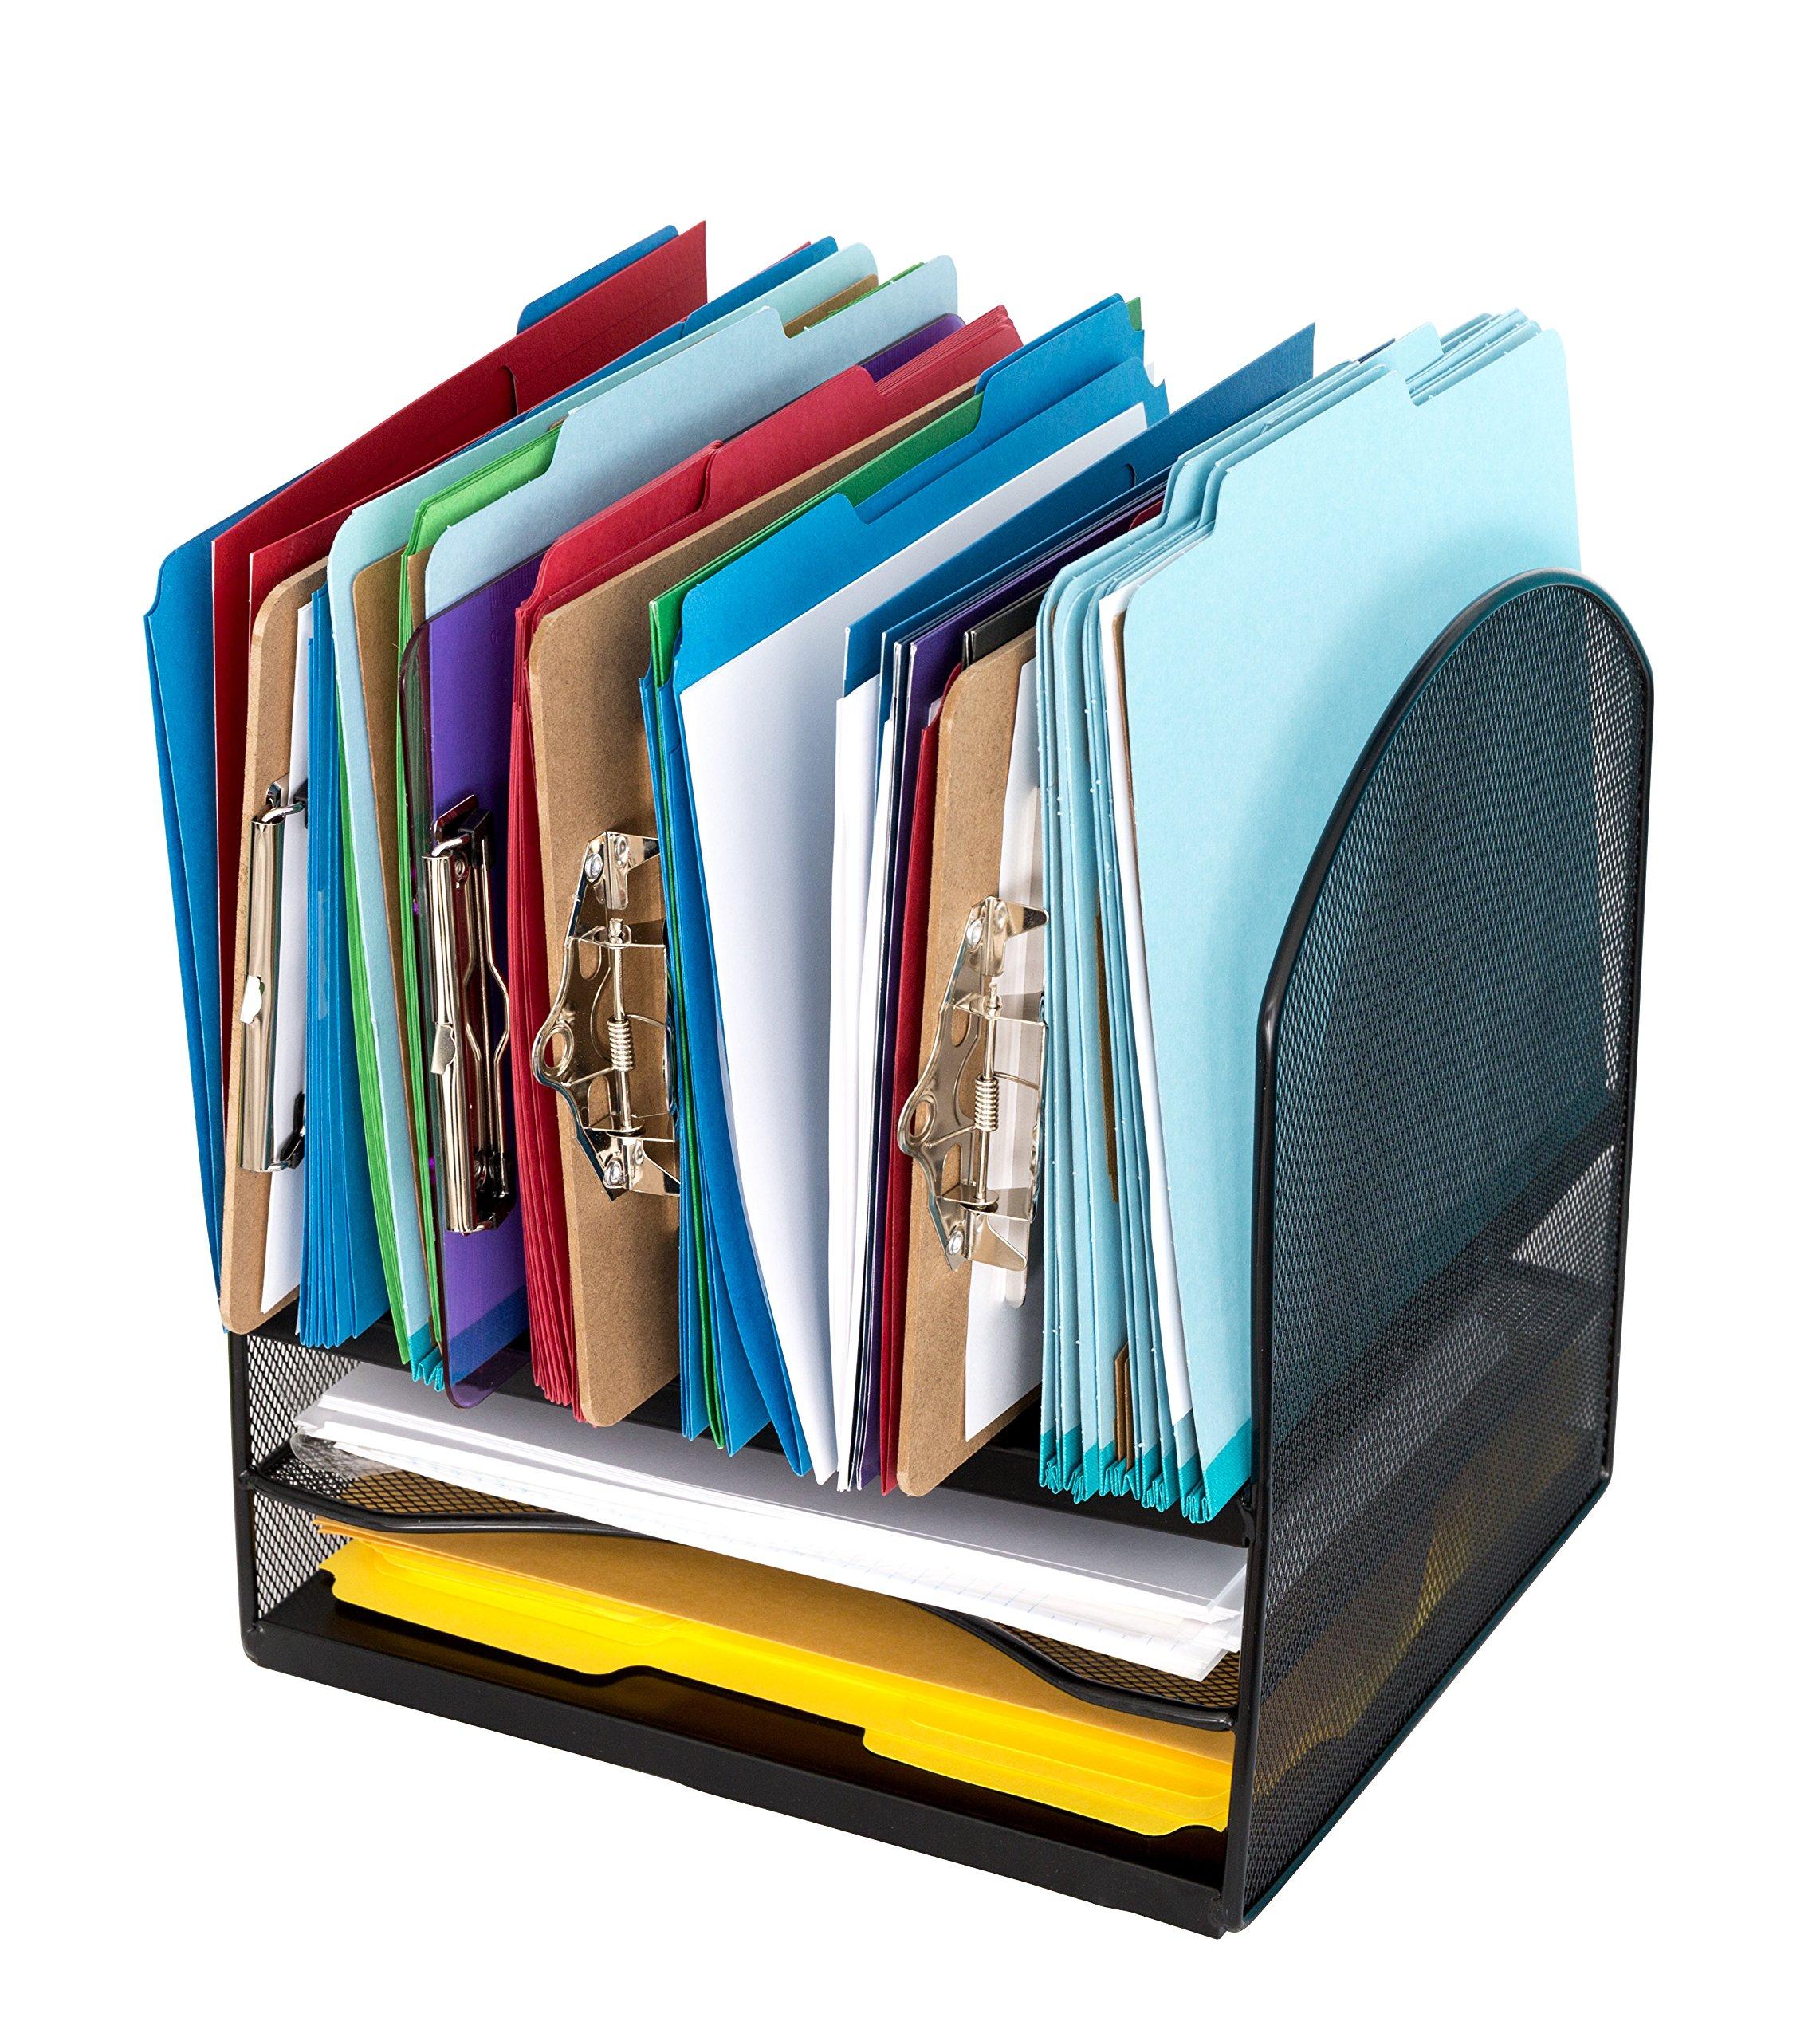 Metal Desktop File Organizer, 8 Compartment Metal Mesh Organizer, Easily organize home or office binders, folders, files, books, and more